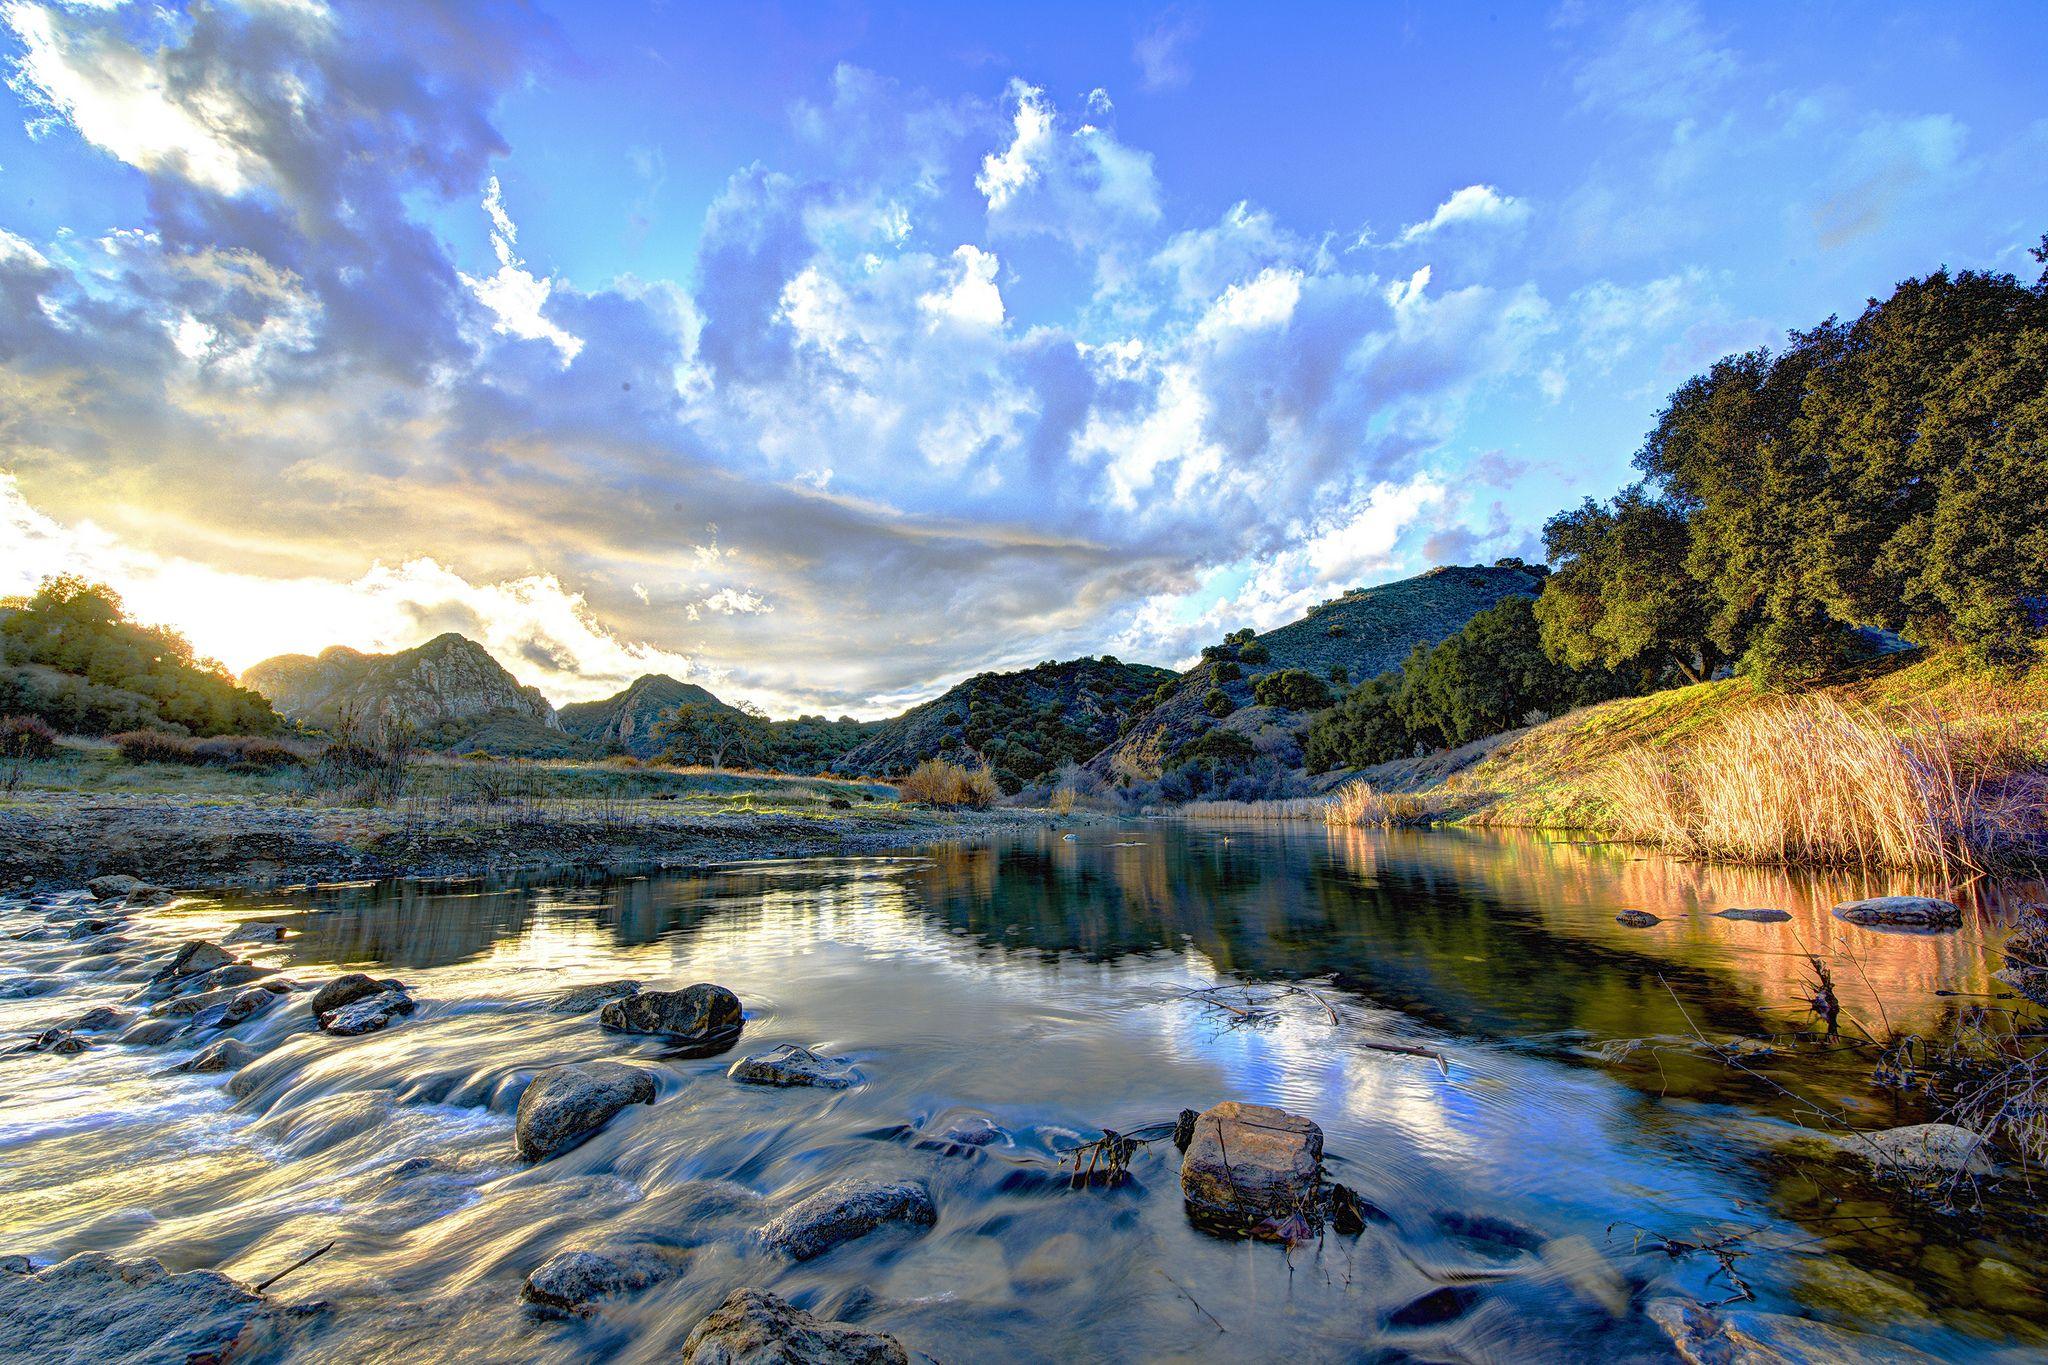 Nikon D800e Hdr Malibu Landscape Photography With 14 24 Mm Wide